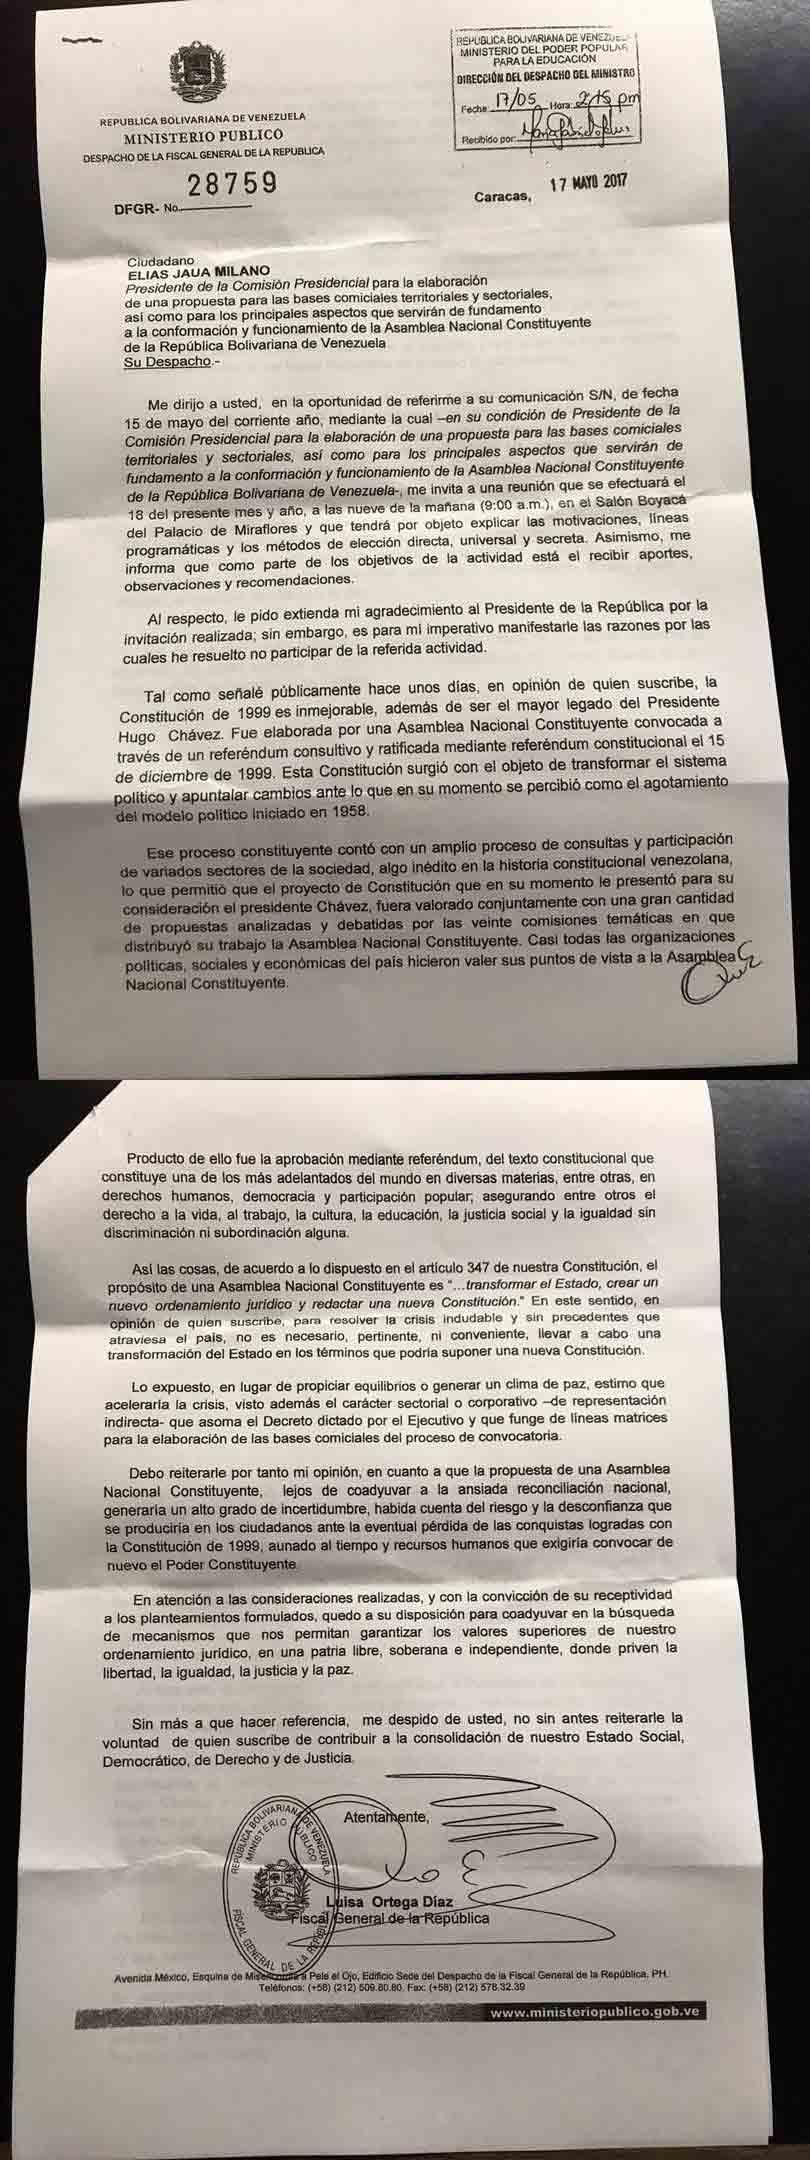 Carta de Luisa Ortega Díaz a Elías Jaua